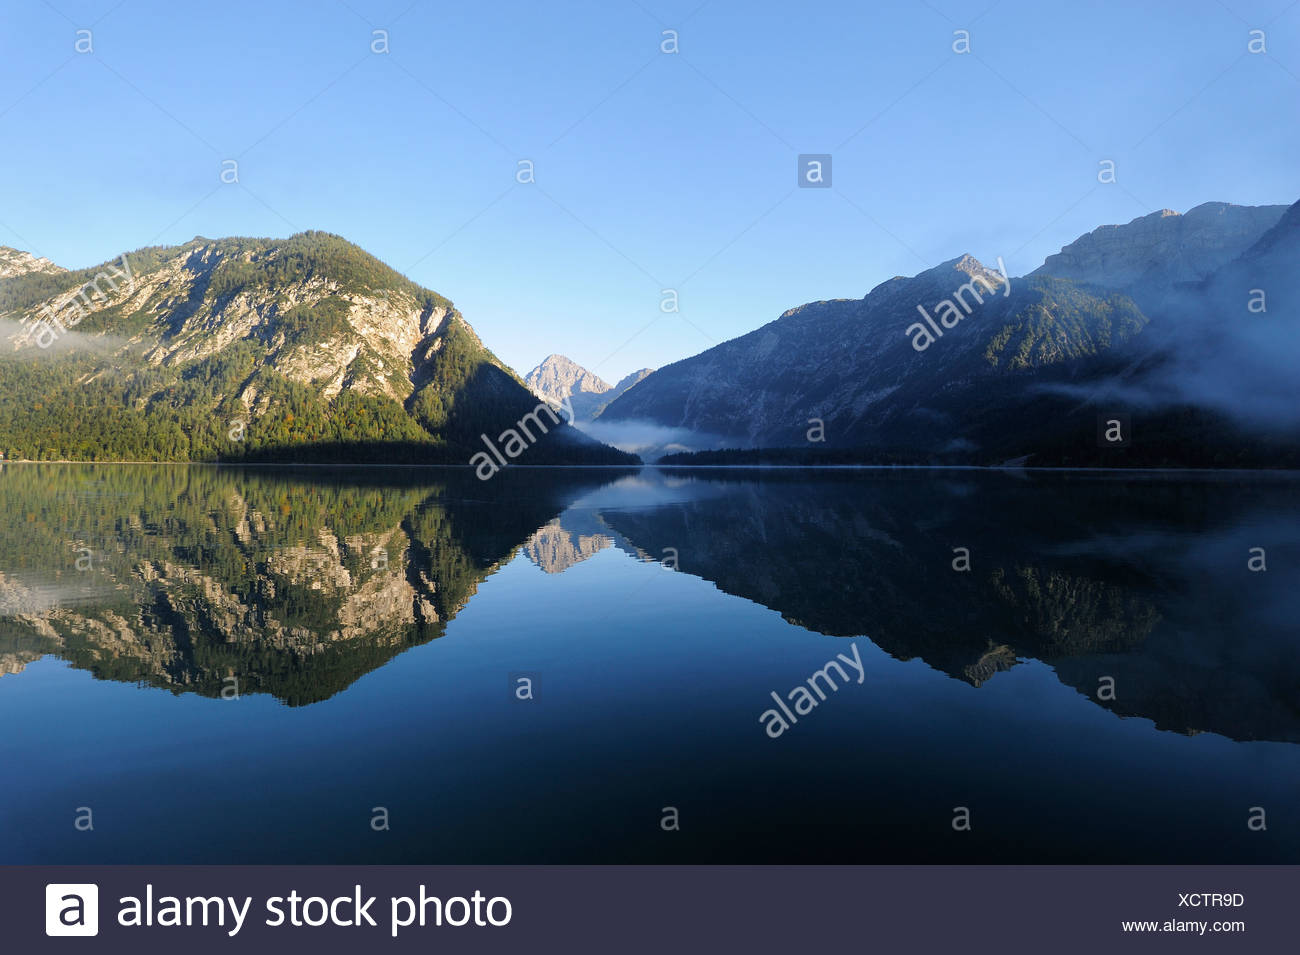 Lago Plansee, Alpi Ammergau, Ammergebirge montagne, guardando verso Thaneller montagna delle Alpi Lechtal, Tirolo, Austria Immagini Stock